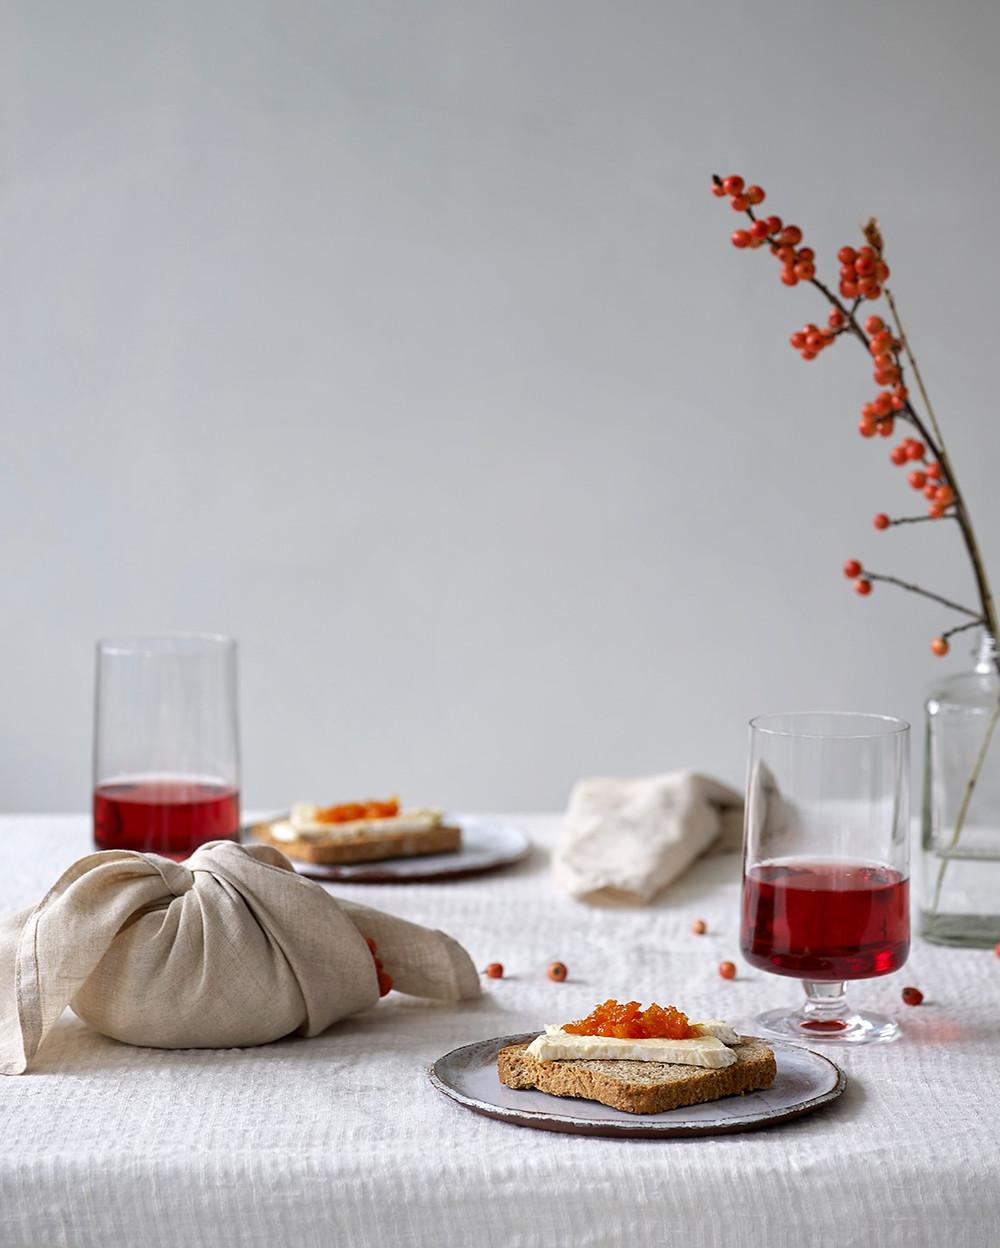 Brødskive med brie og gresskarmarmelade